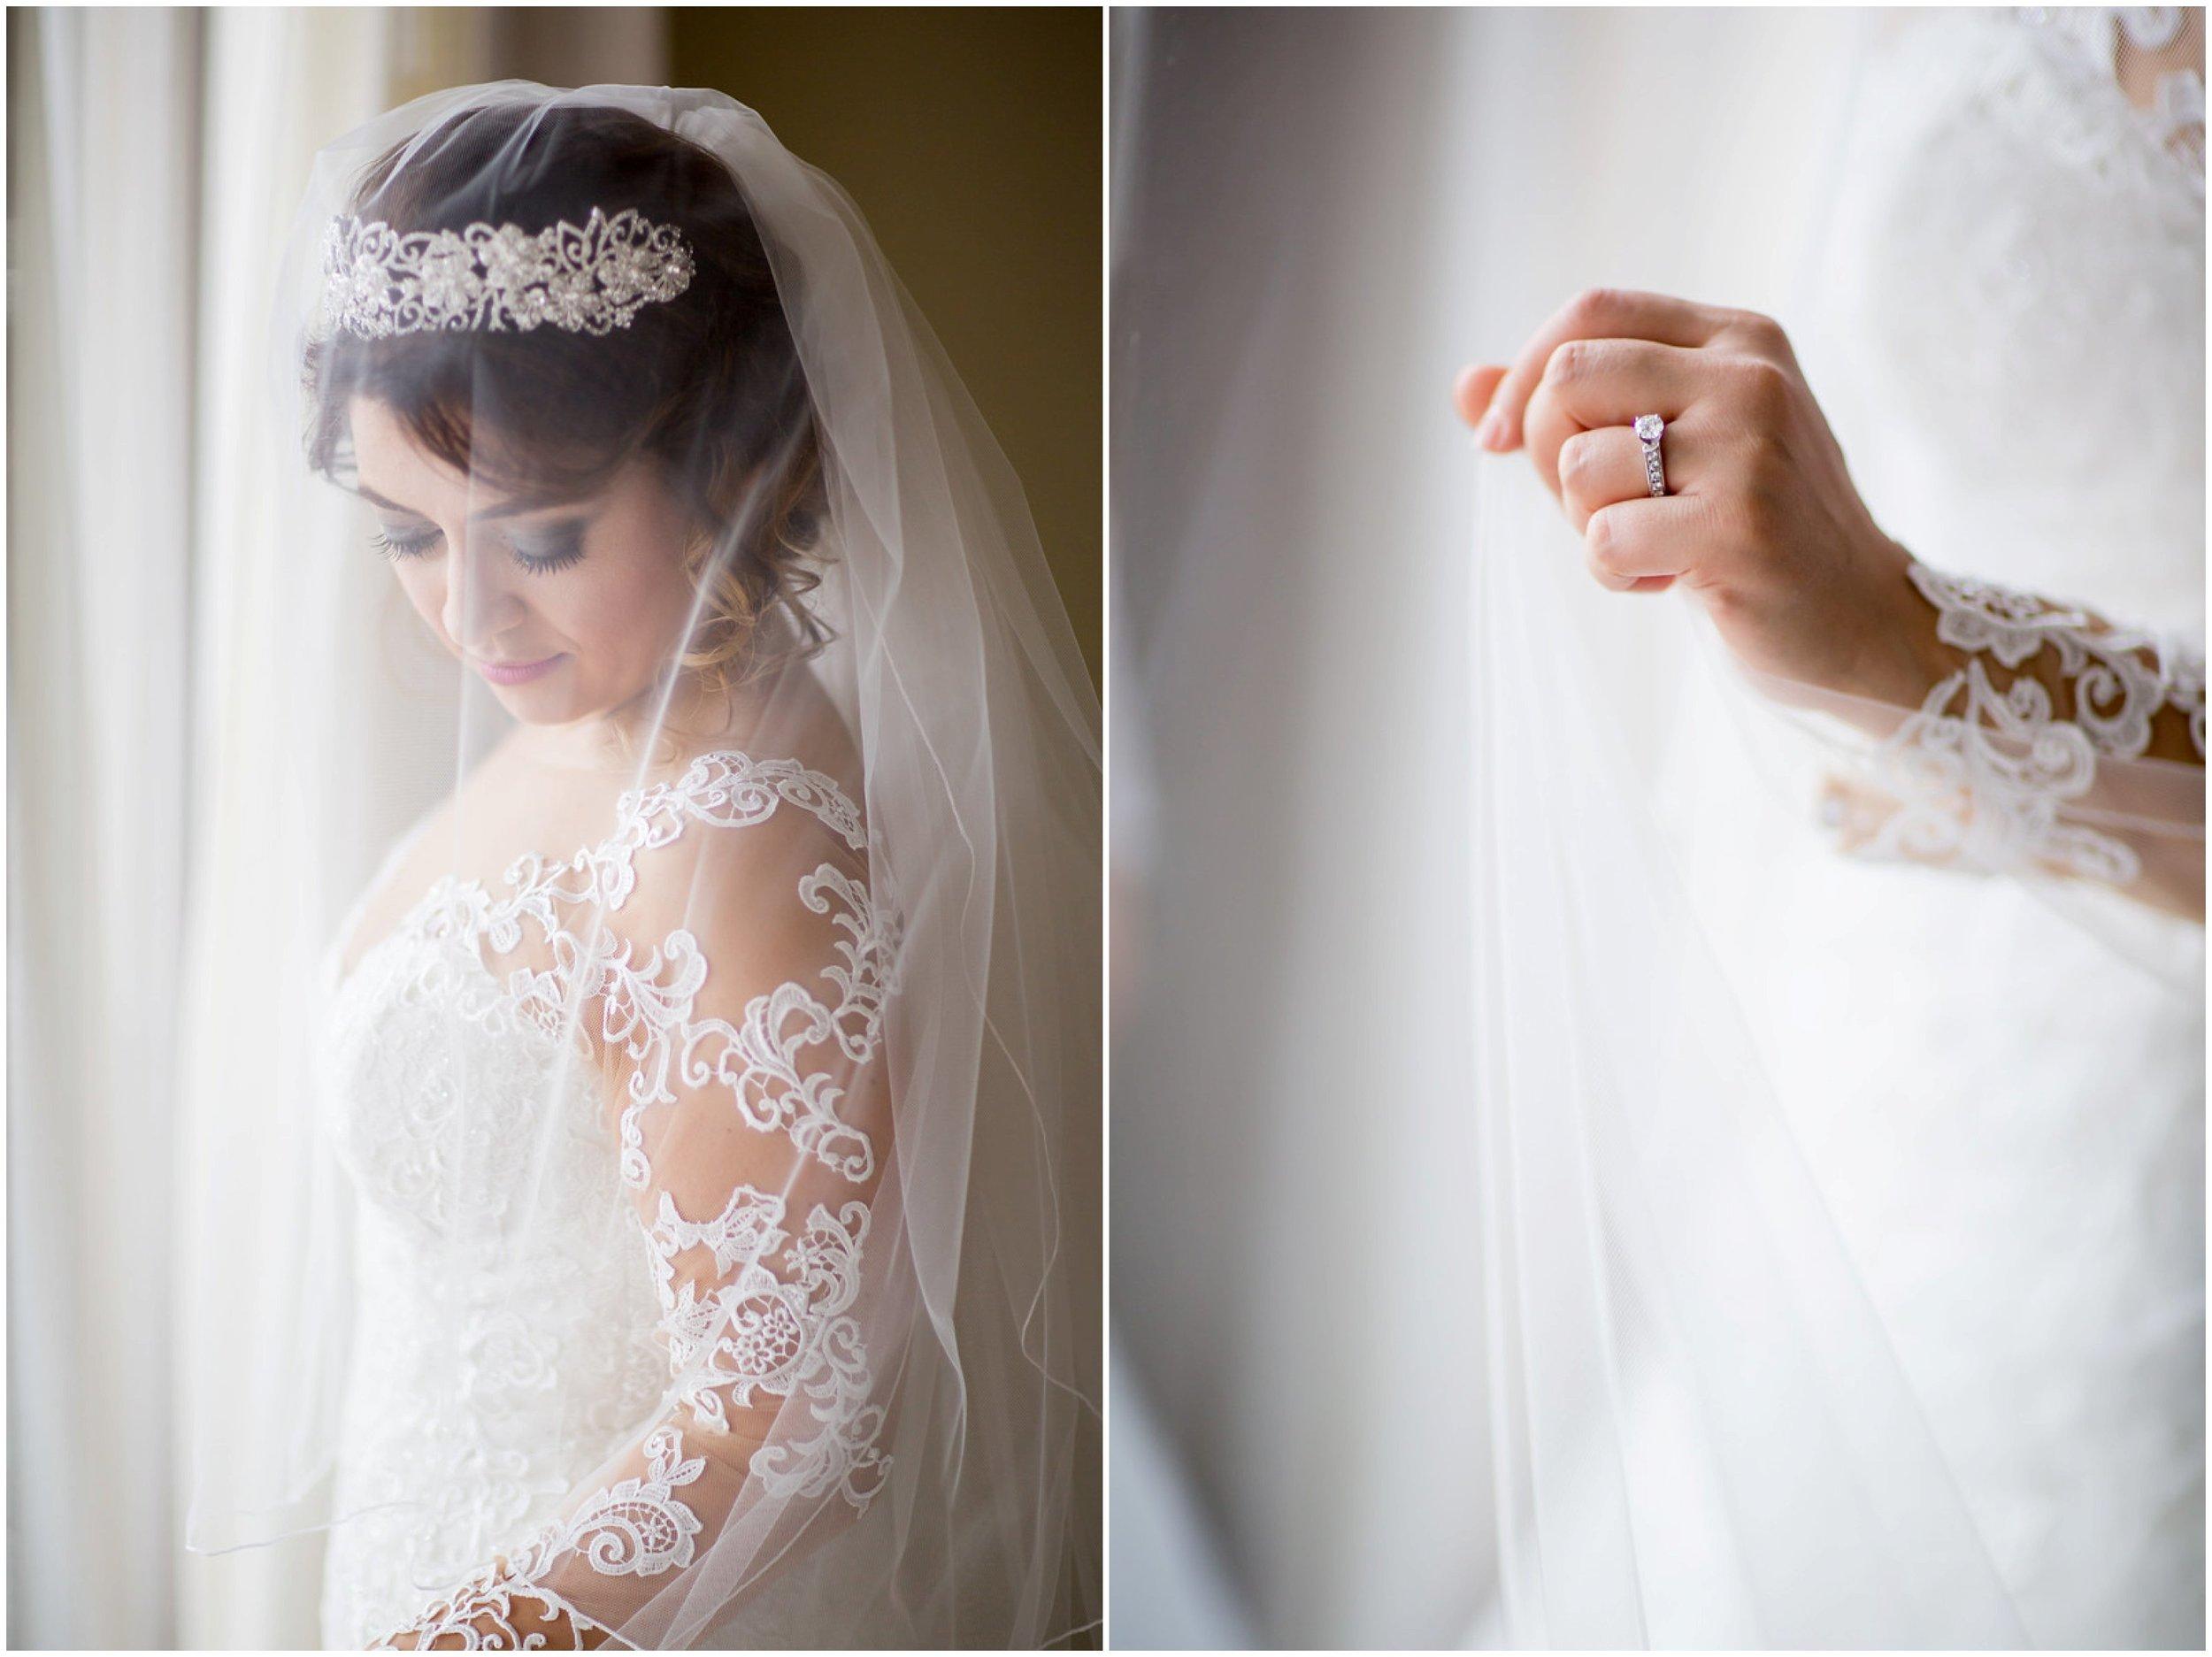 Le Cape Weddings- Destination Wedding Photography -ShayanandNikkie-187-X3_LuxuryDestinationPhotographer.jpg